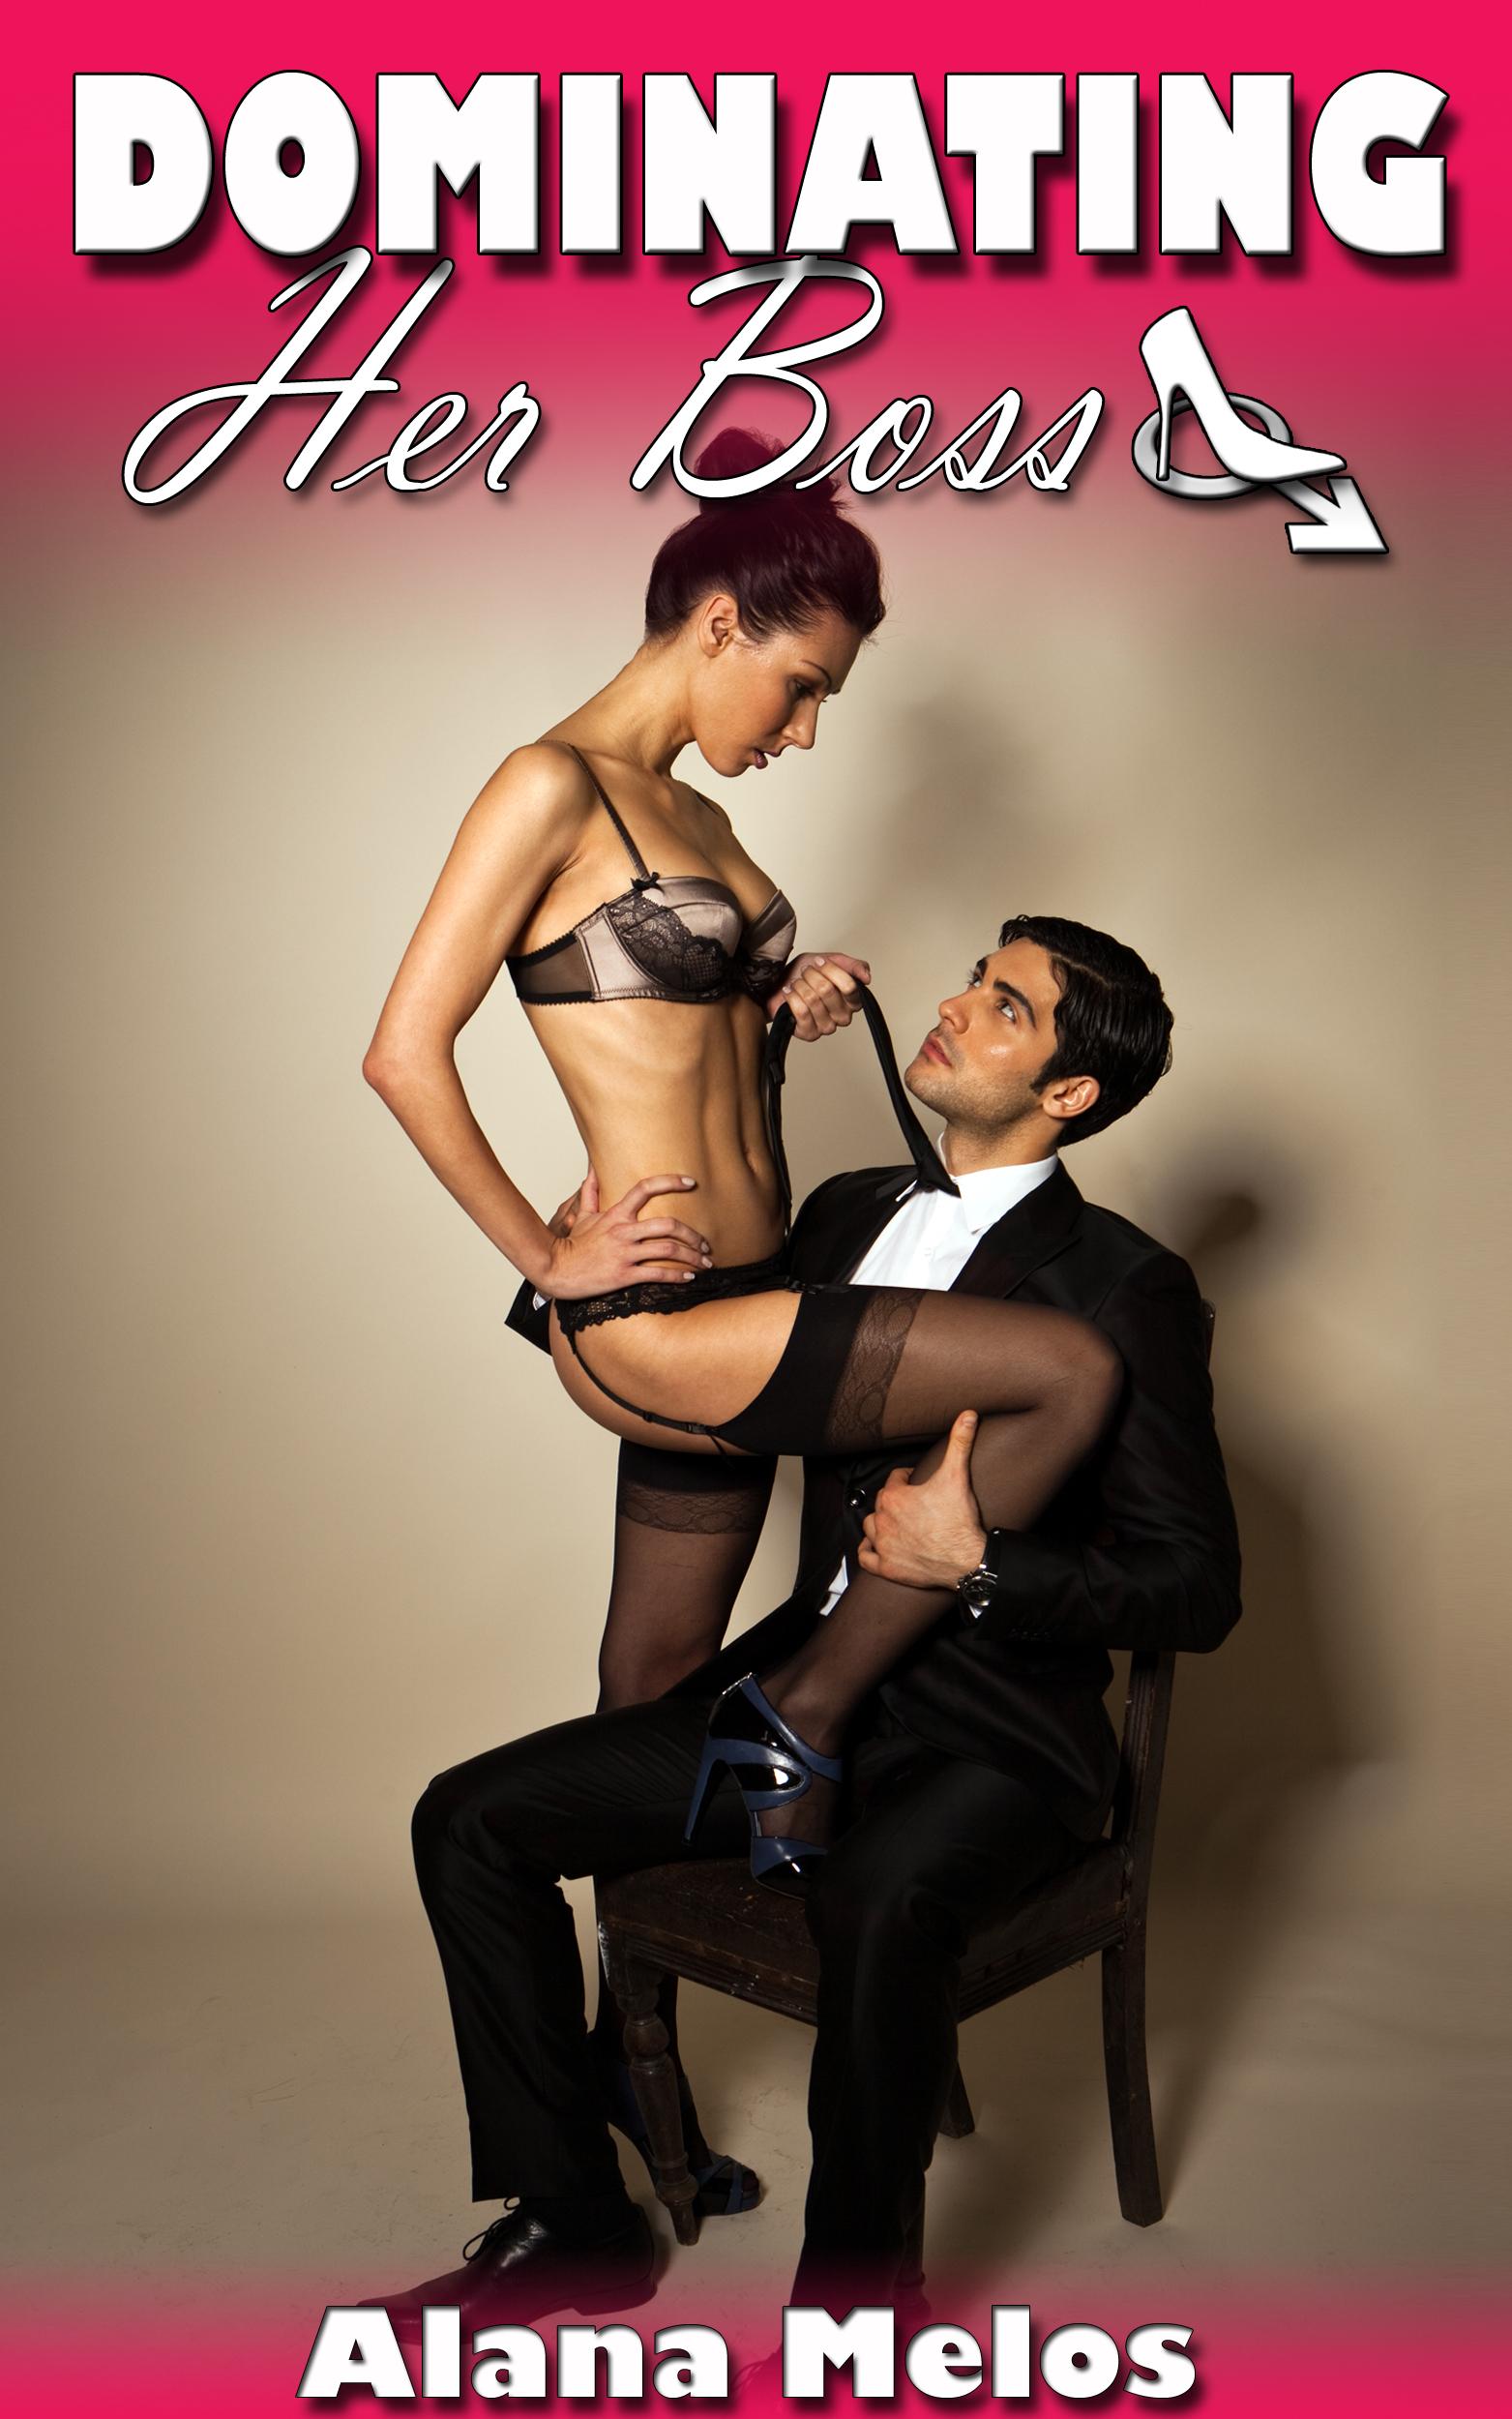 dominant wife spanks henpecked husband